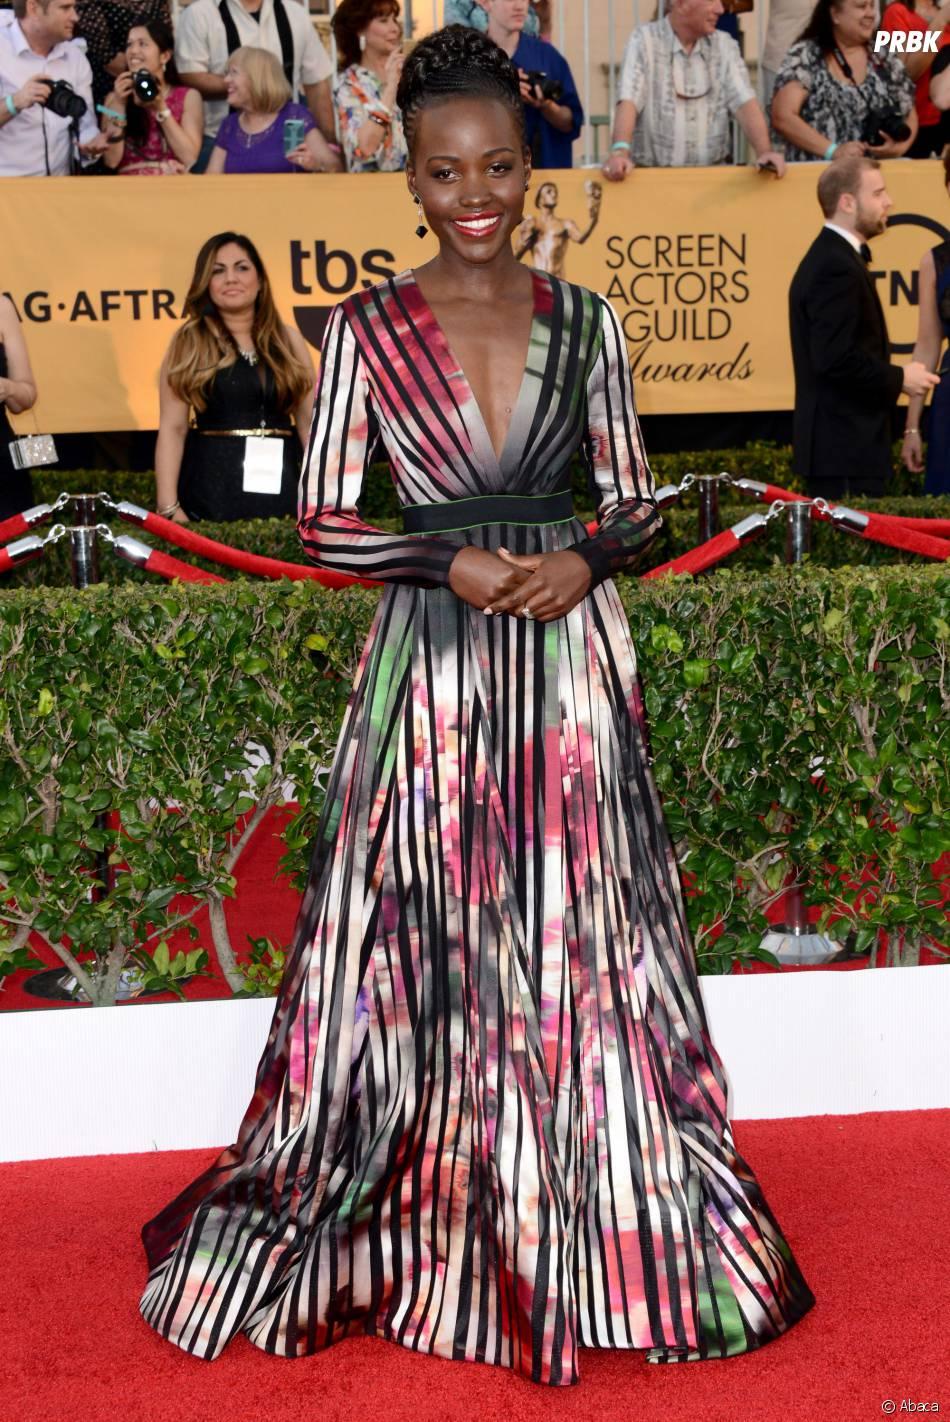 Lupita Nyong'o aux SAG Awards 2015, le 25 janvier 2015 à Los Angeles